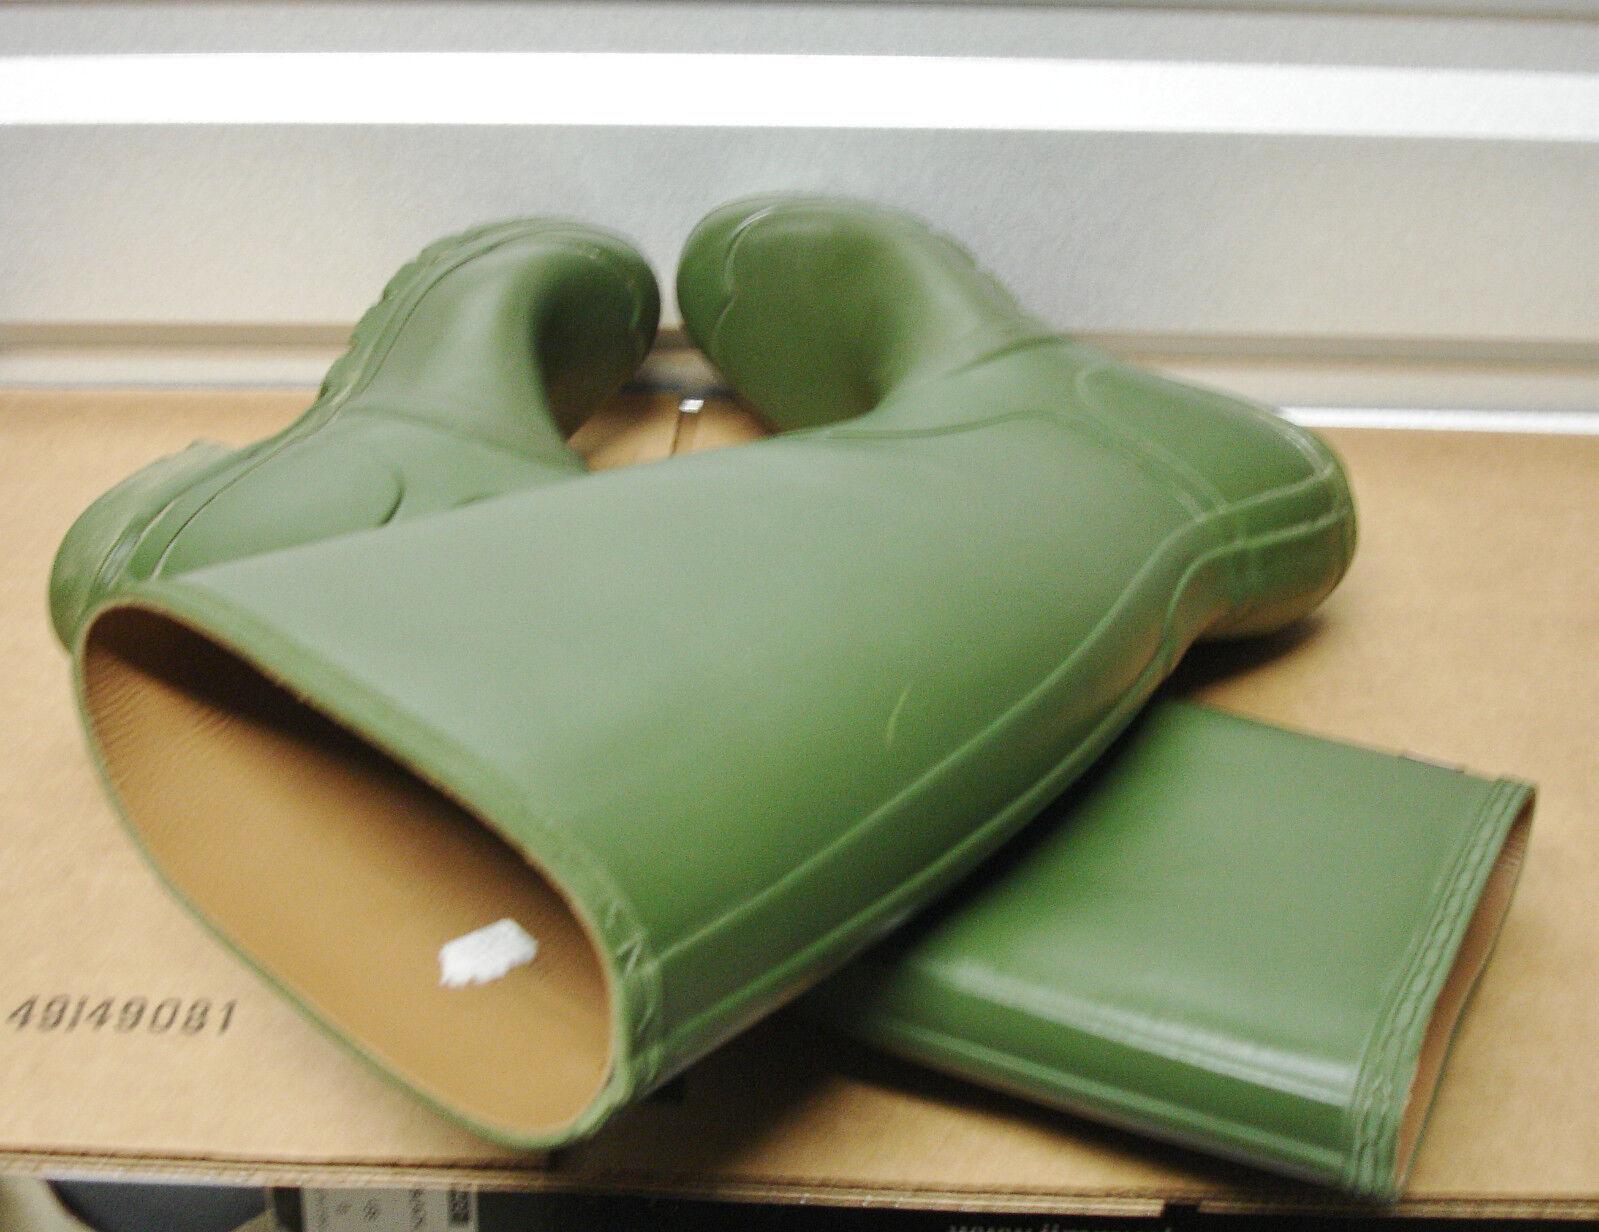 Rare Hunter Limited Ed Classic Green *Pelle Lined* Rubber Stivali   10 UK9 EU43